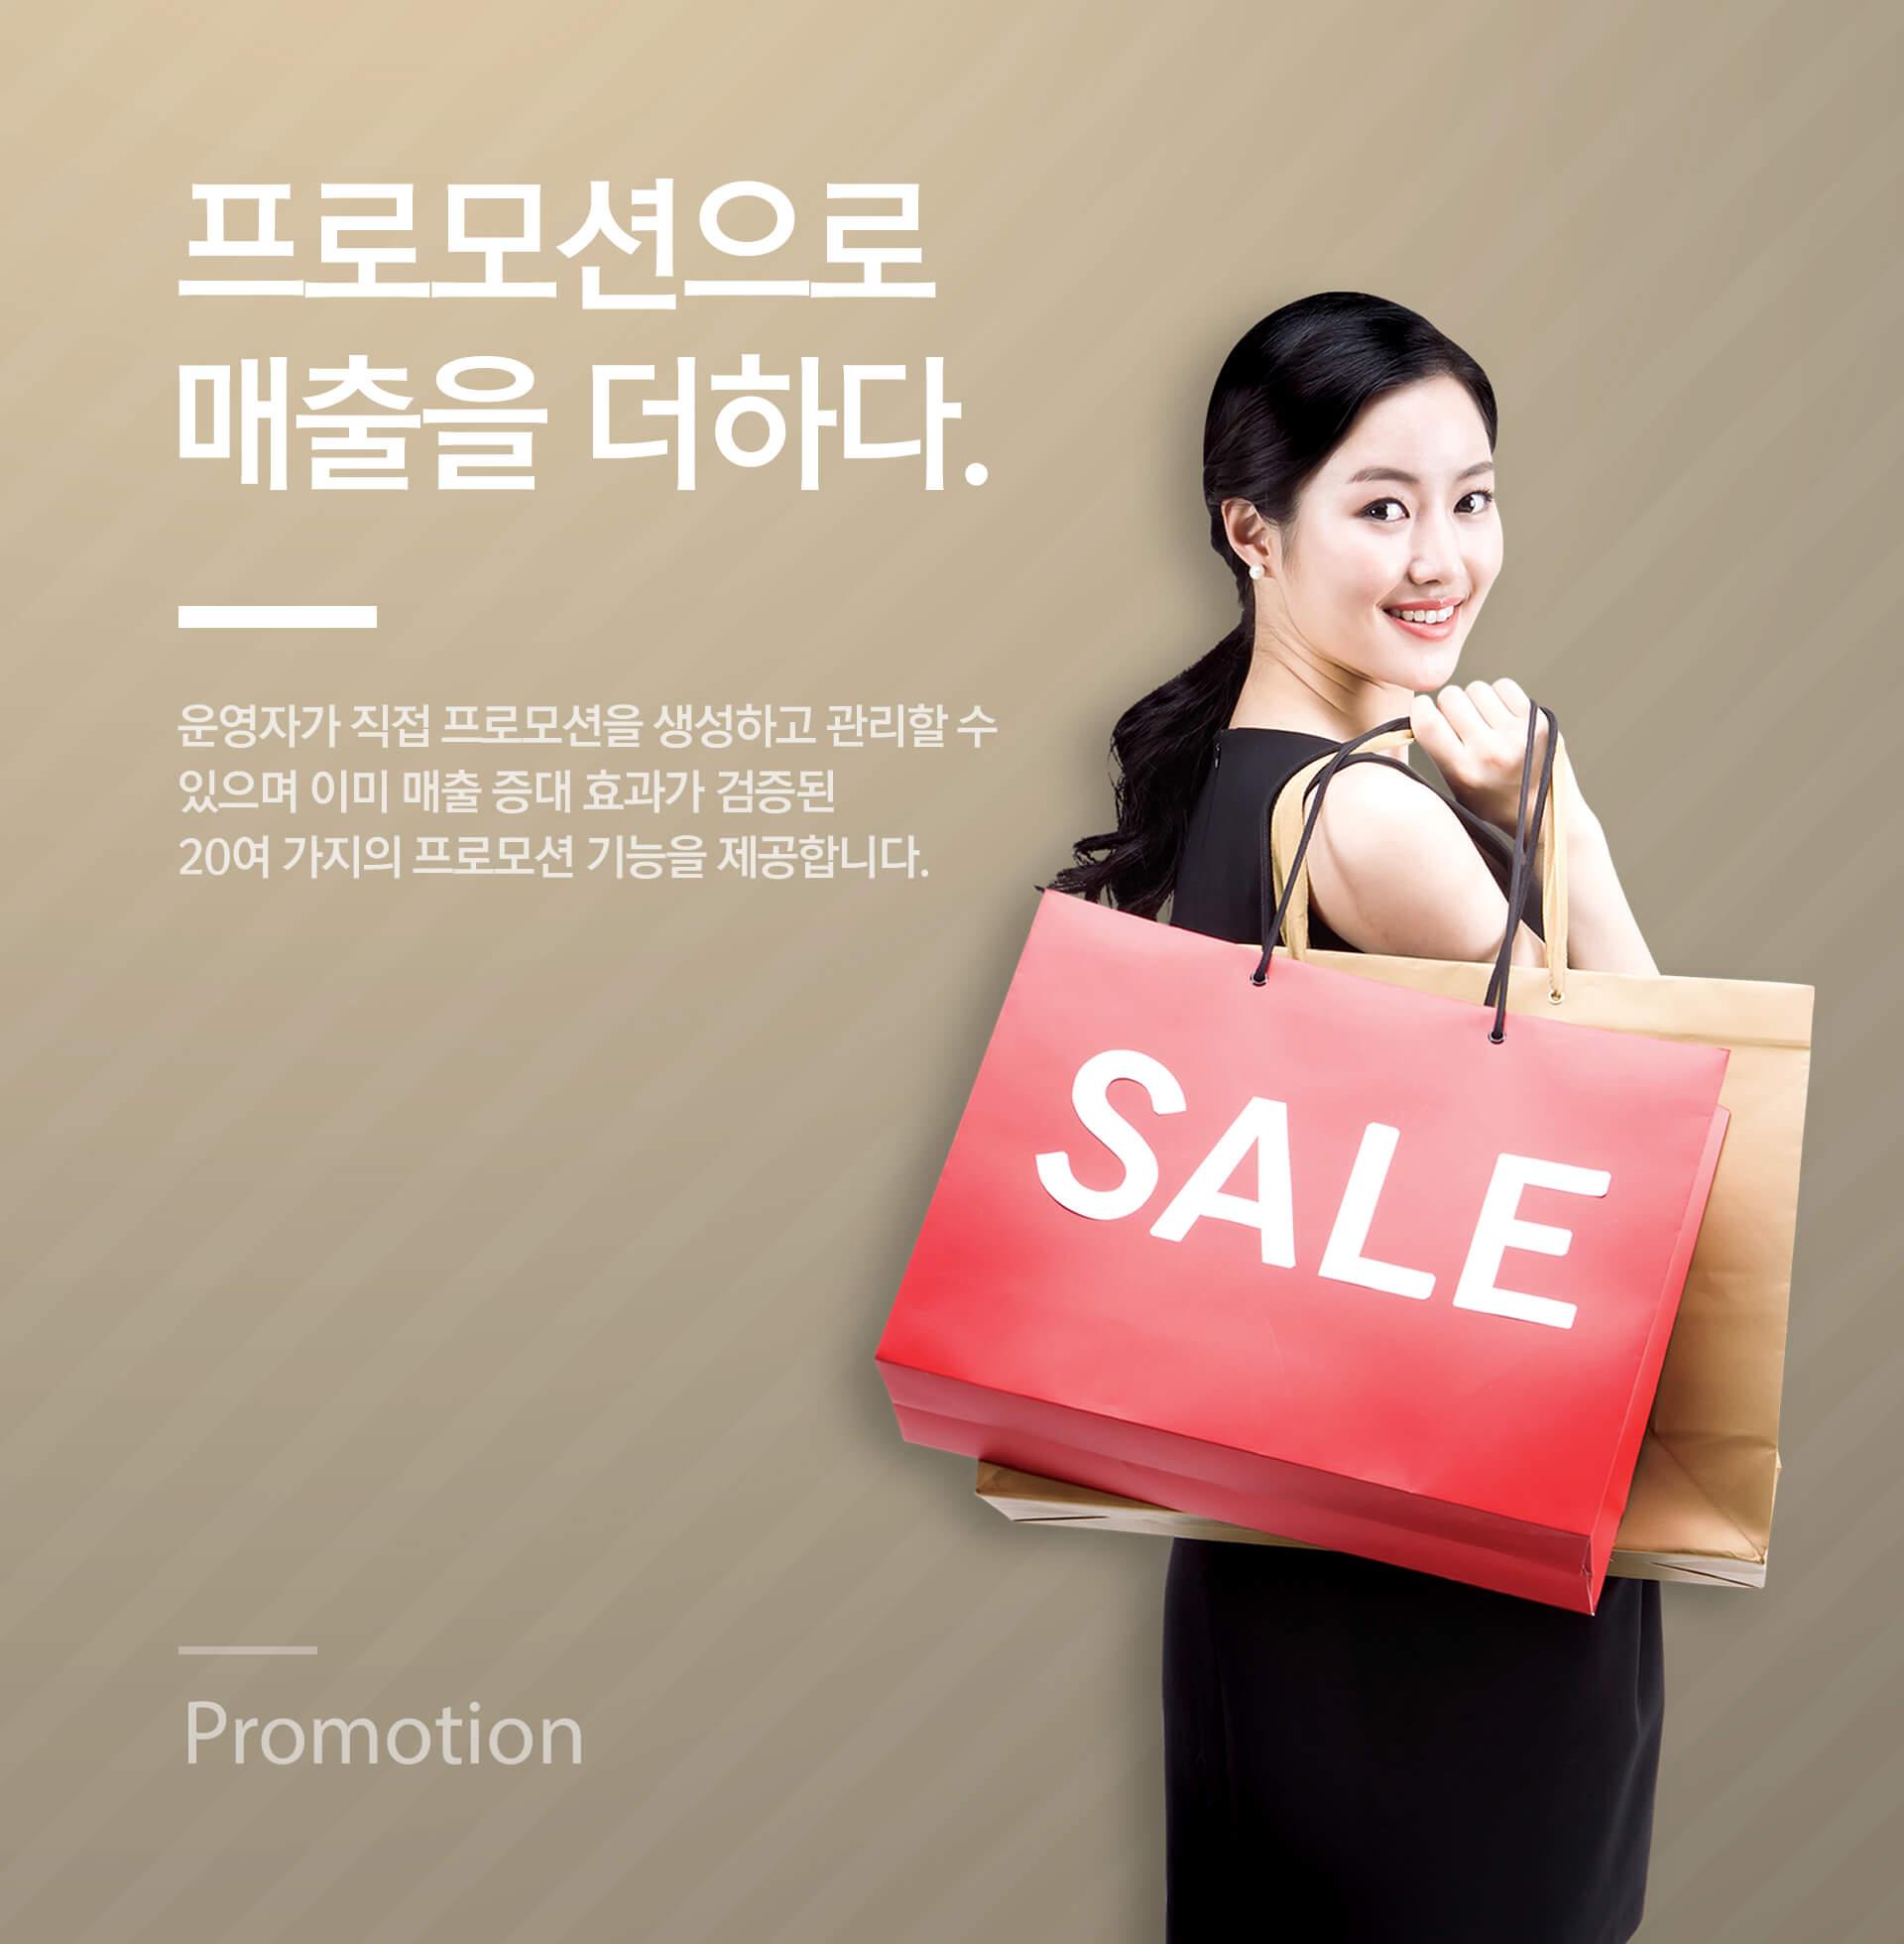 bigstore_promotion